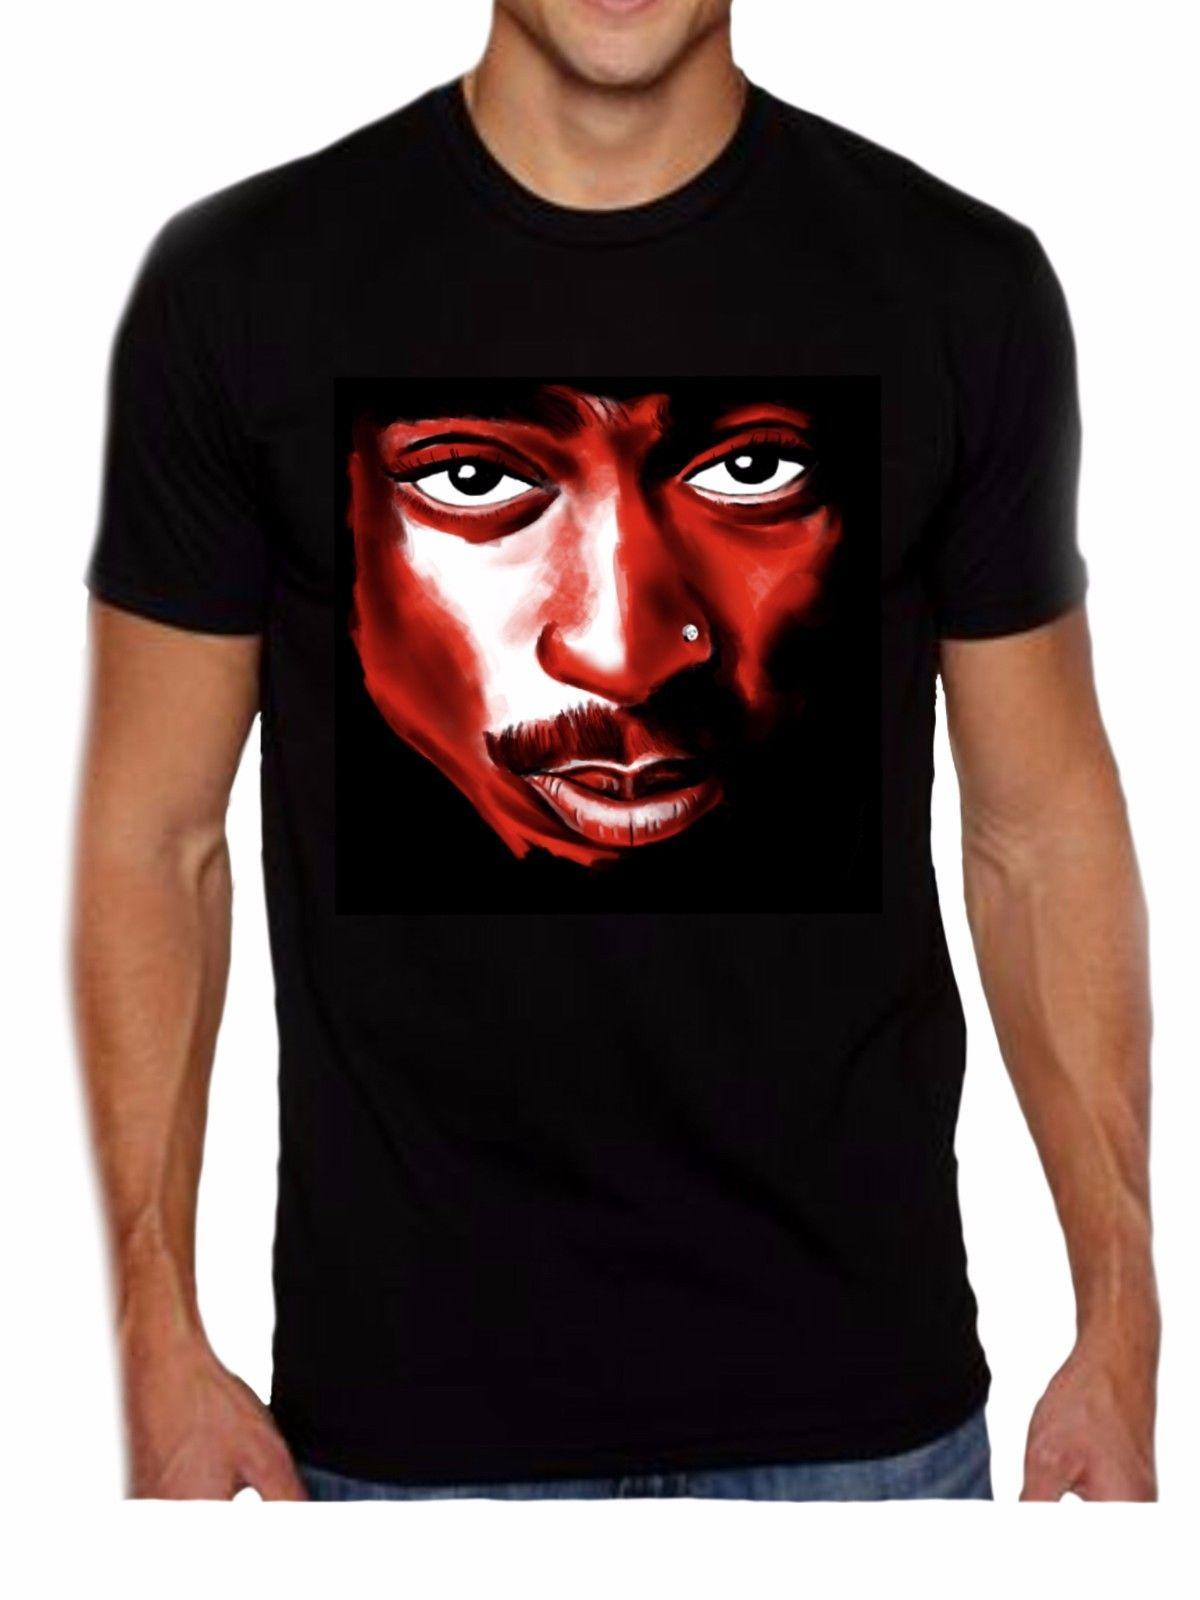 ea9d3a1172c Tupac All Eyez on Me - 2Pac - Unisex Black T-Shirt Trump Sweat ...